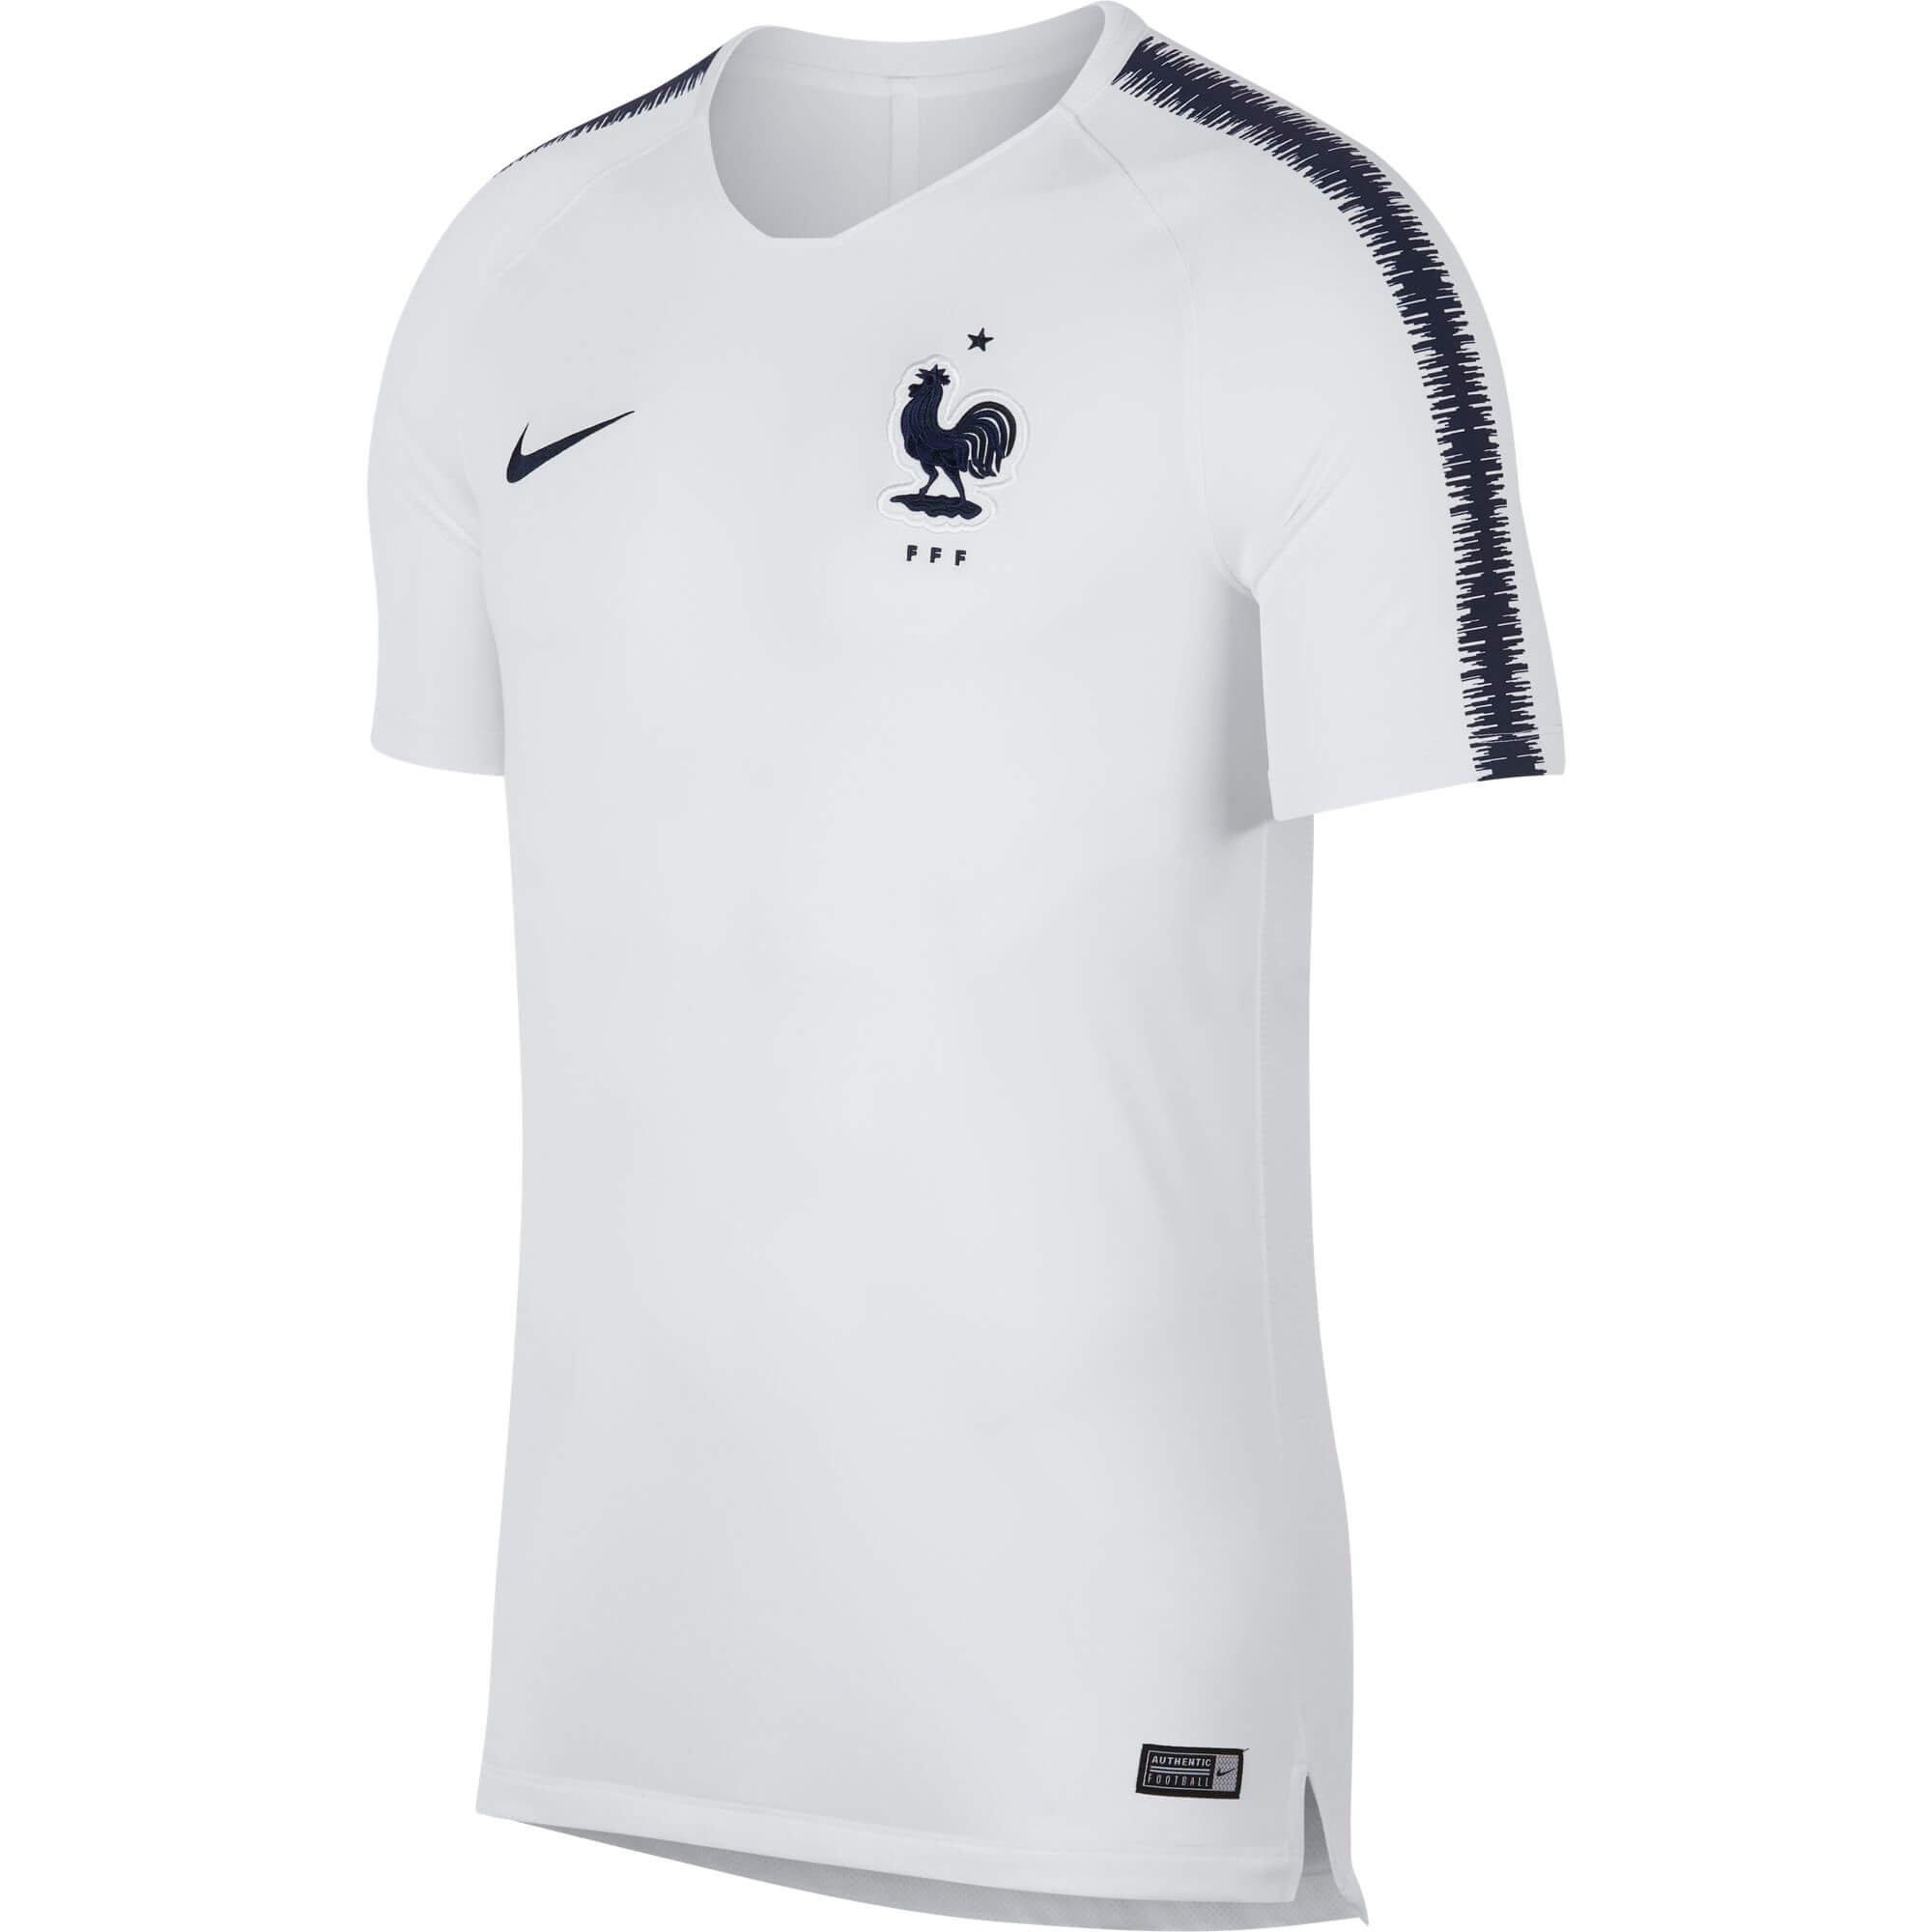 nike fff maillot entrainement blanc cdm 2018 893283 102. Black Bedroom Furniture Sets. Home Design Ideas